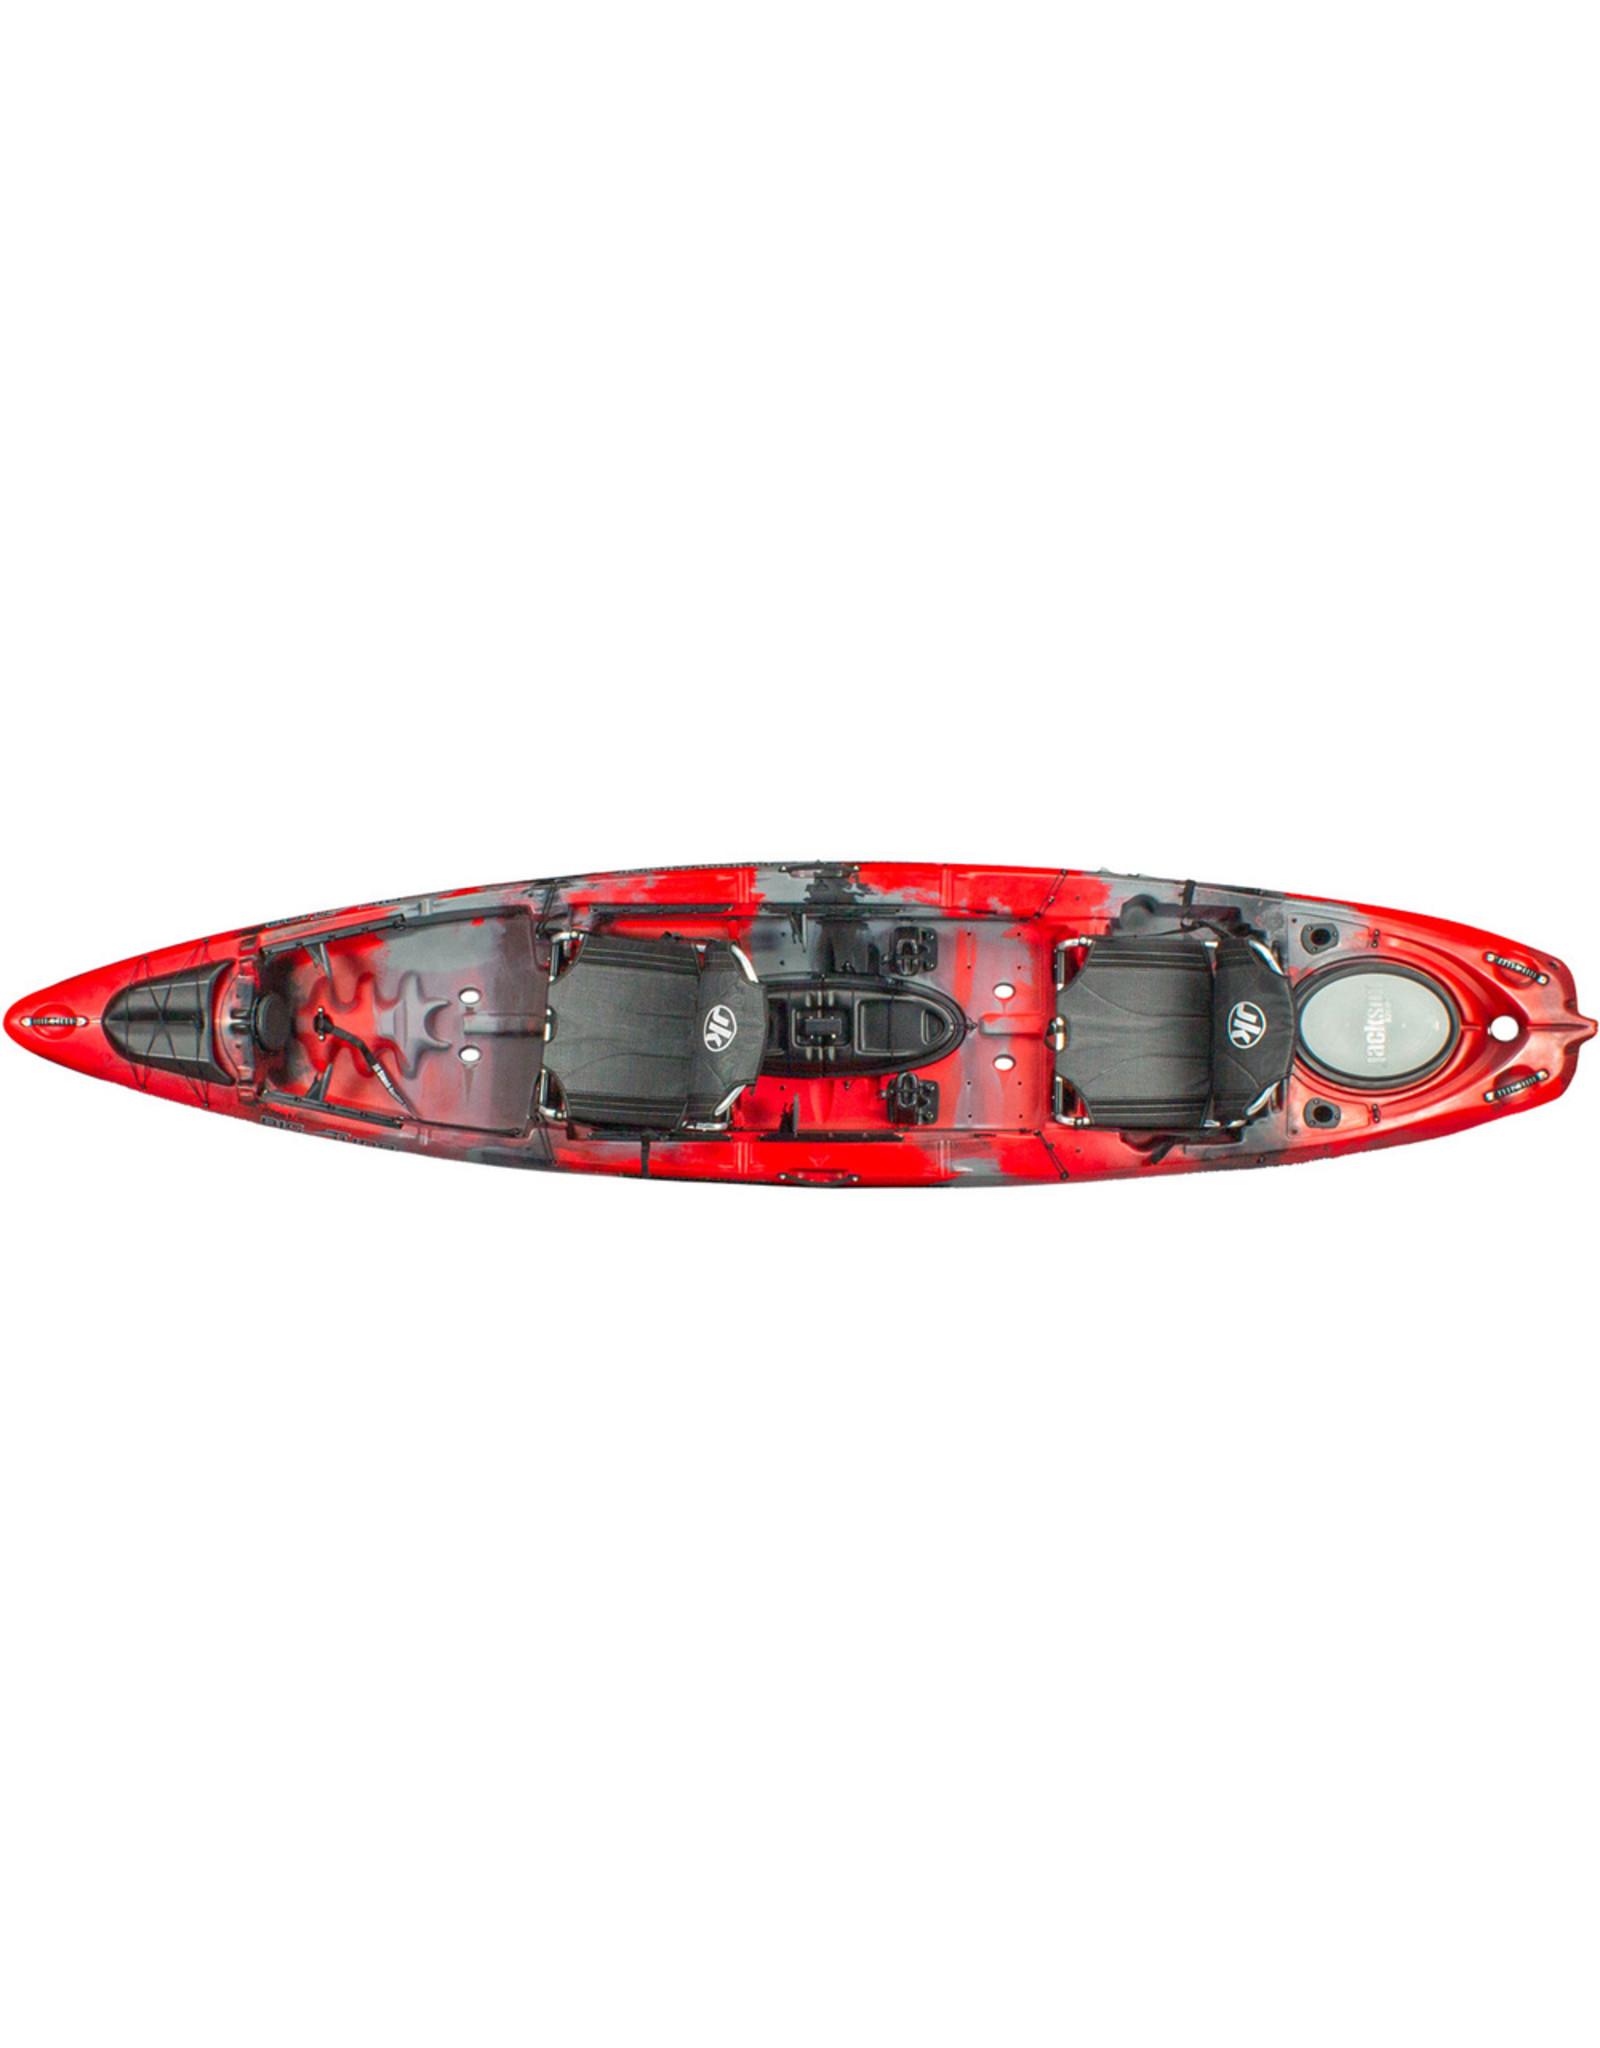 Jackson Kayaks Jackson kayak Big Tuna Rockfish